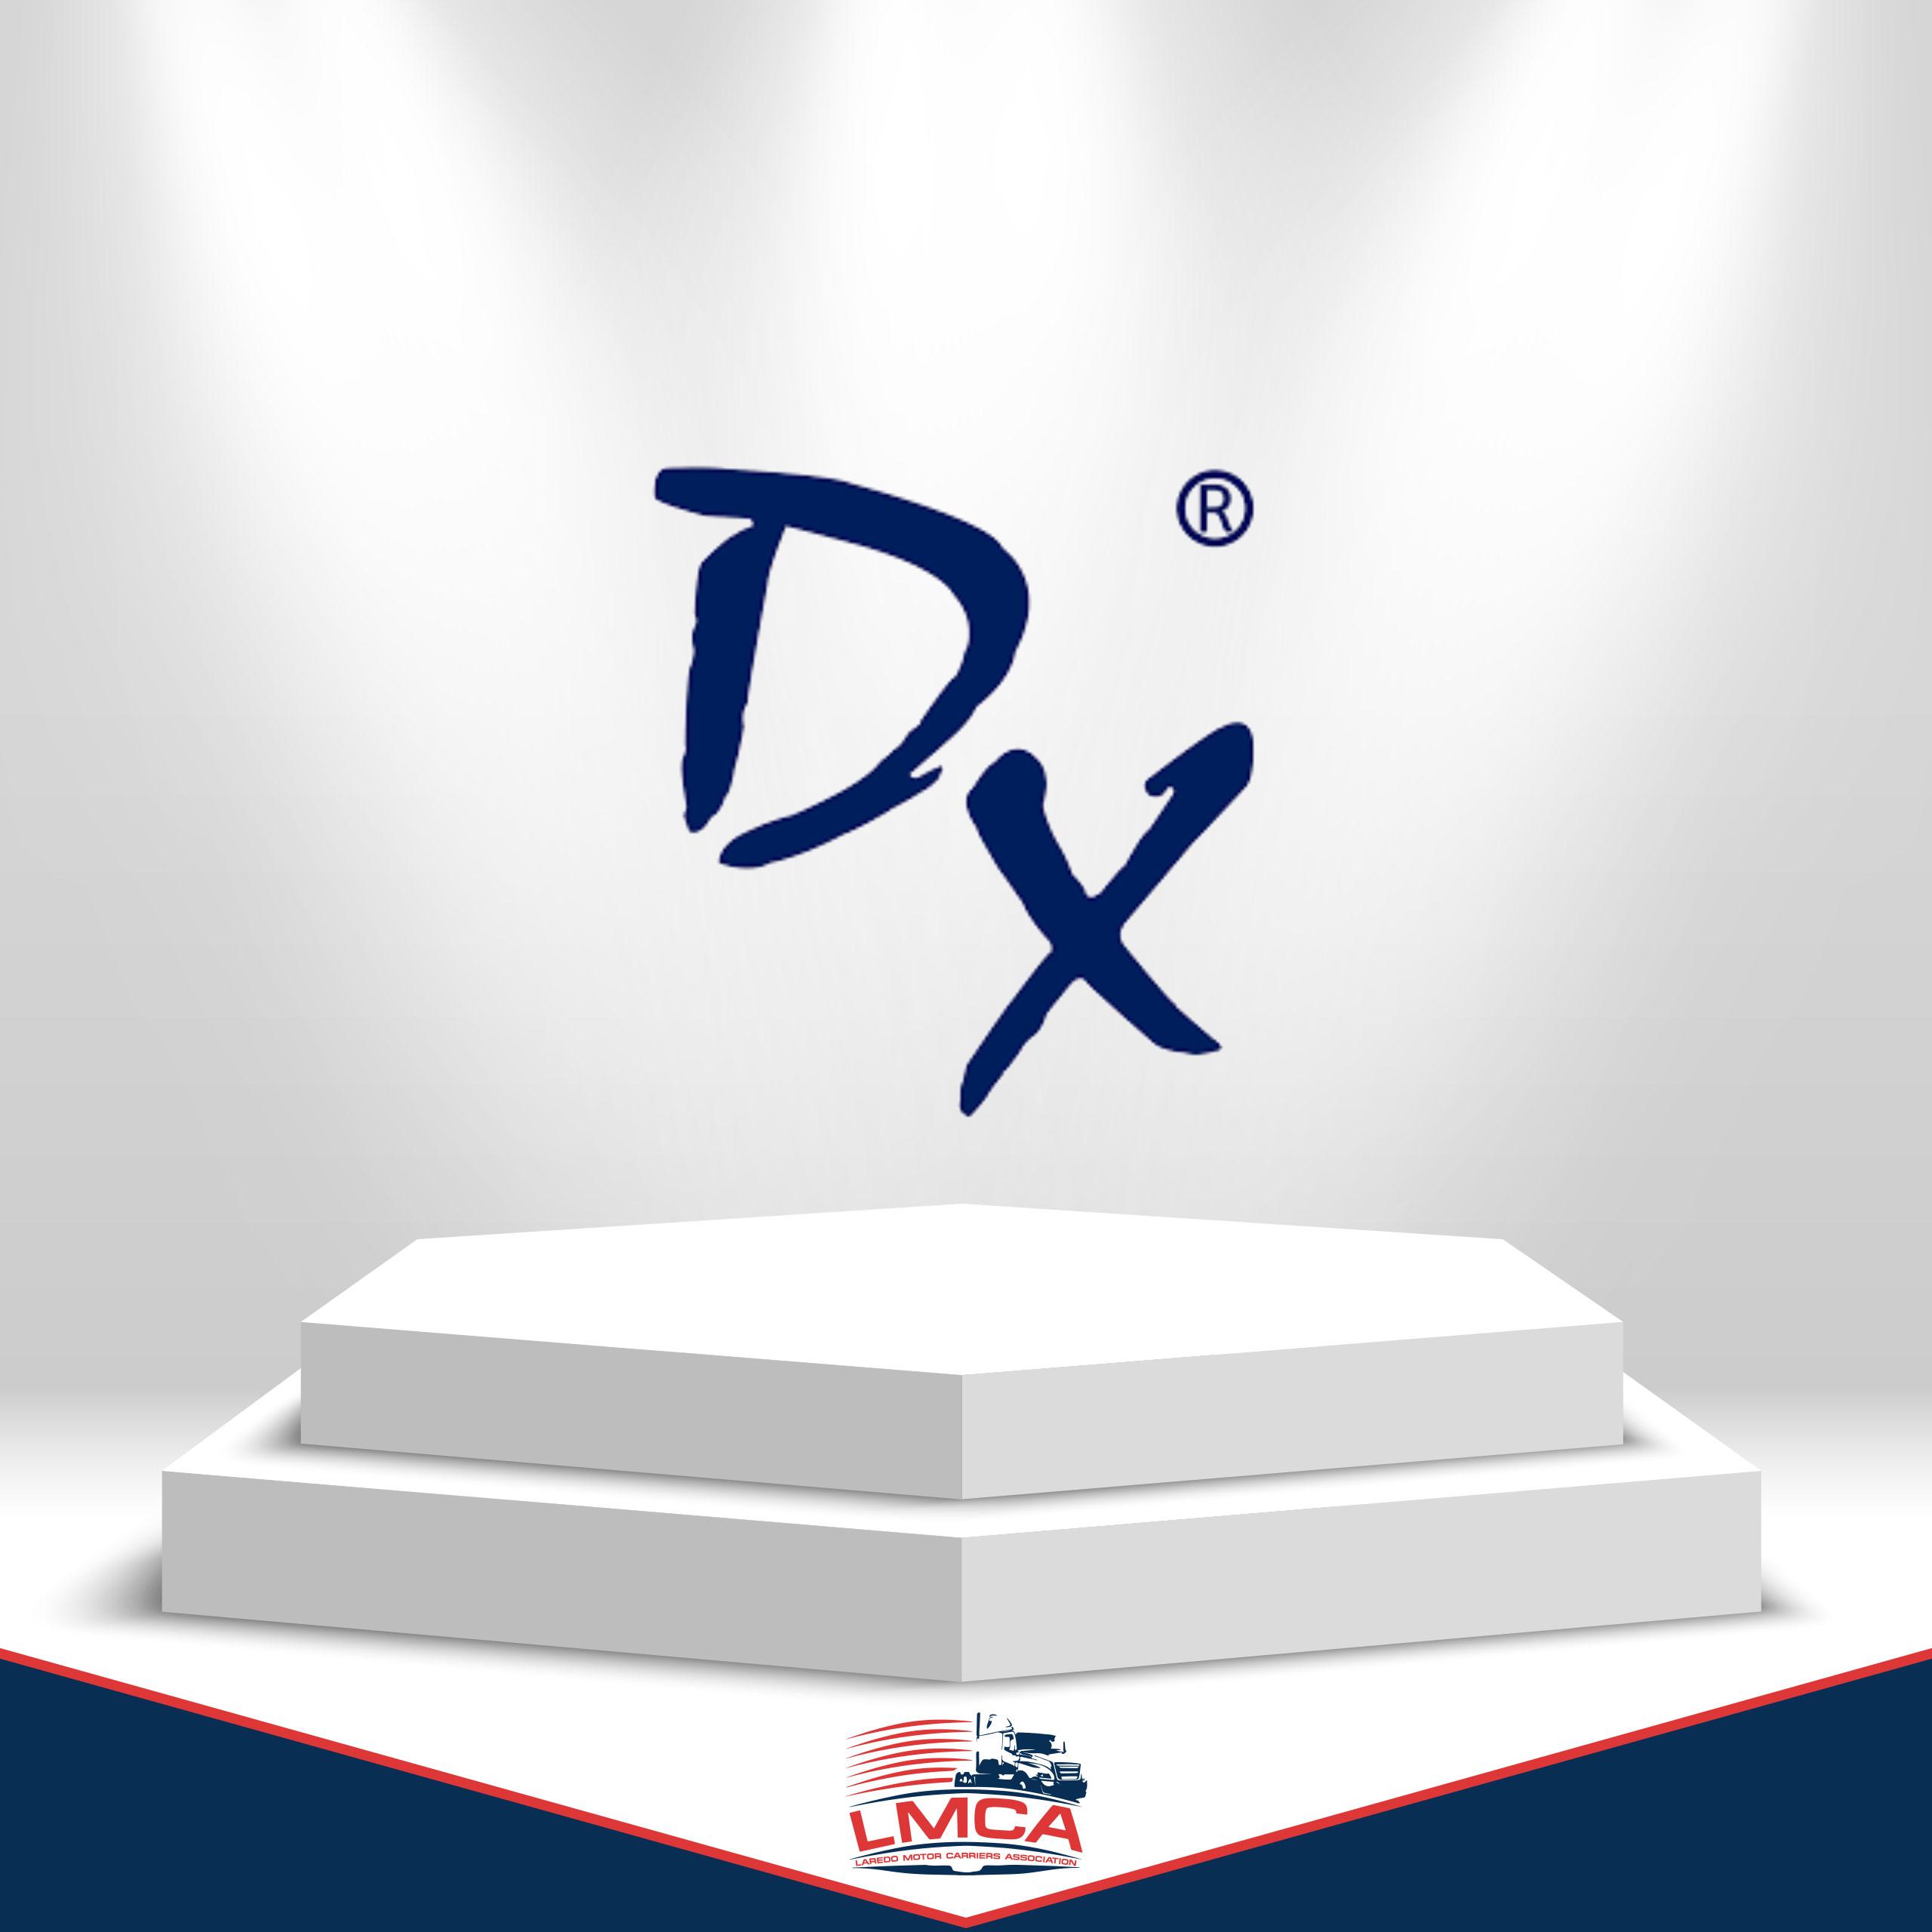 dx-lmca